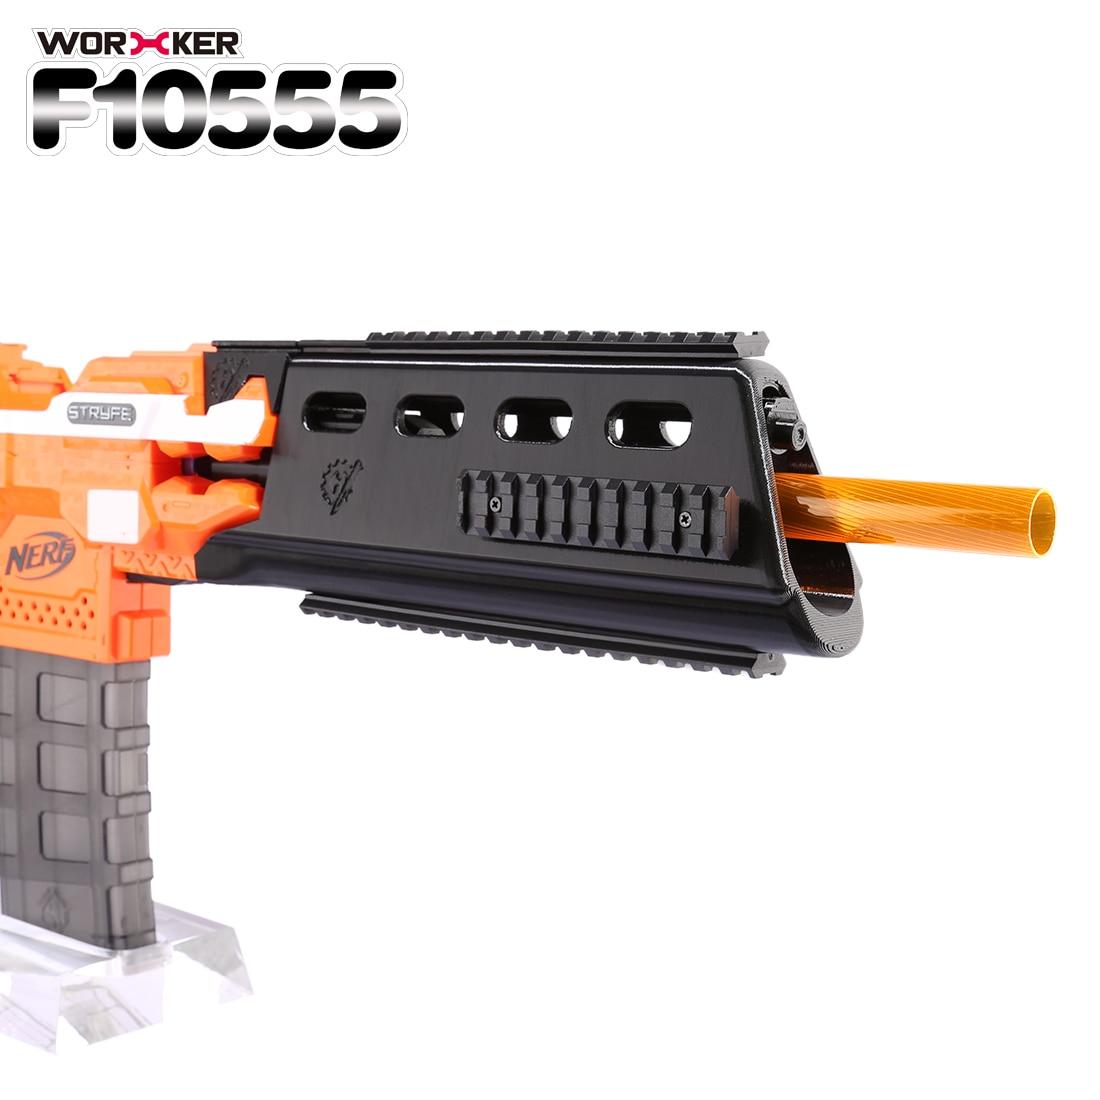 купить Worker f10555 G362.0 3D Printing Long Type Front Tube Kit for Nerf N-Strike Elite Stryfe Blaster - Black по цене 2623.34 рублей